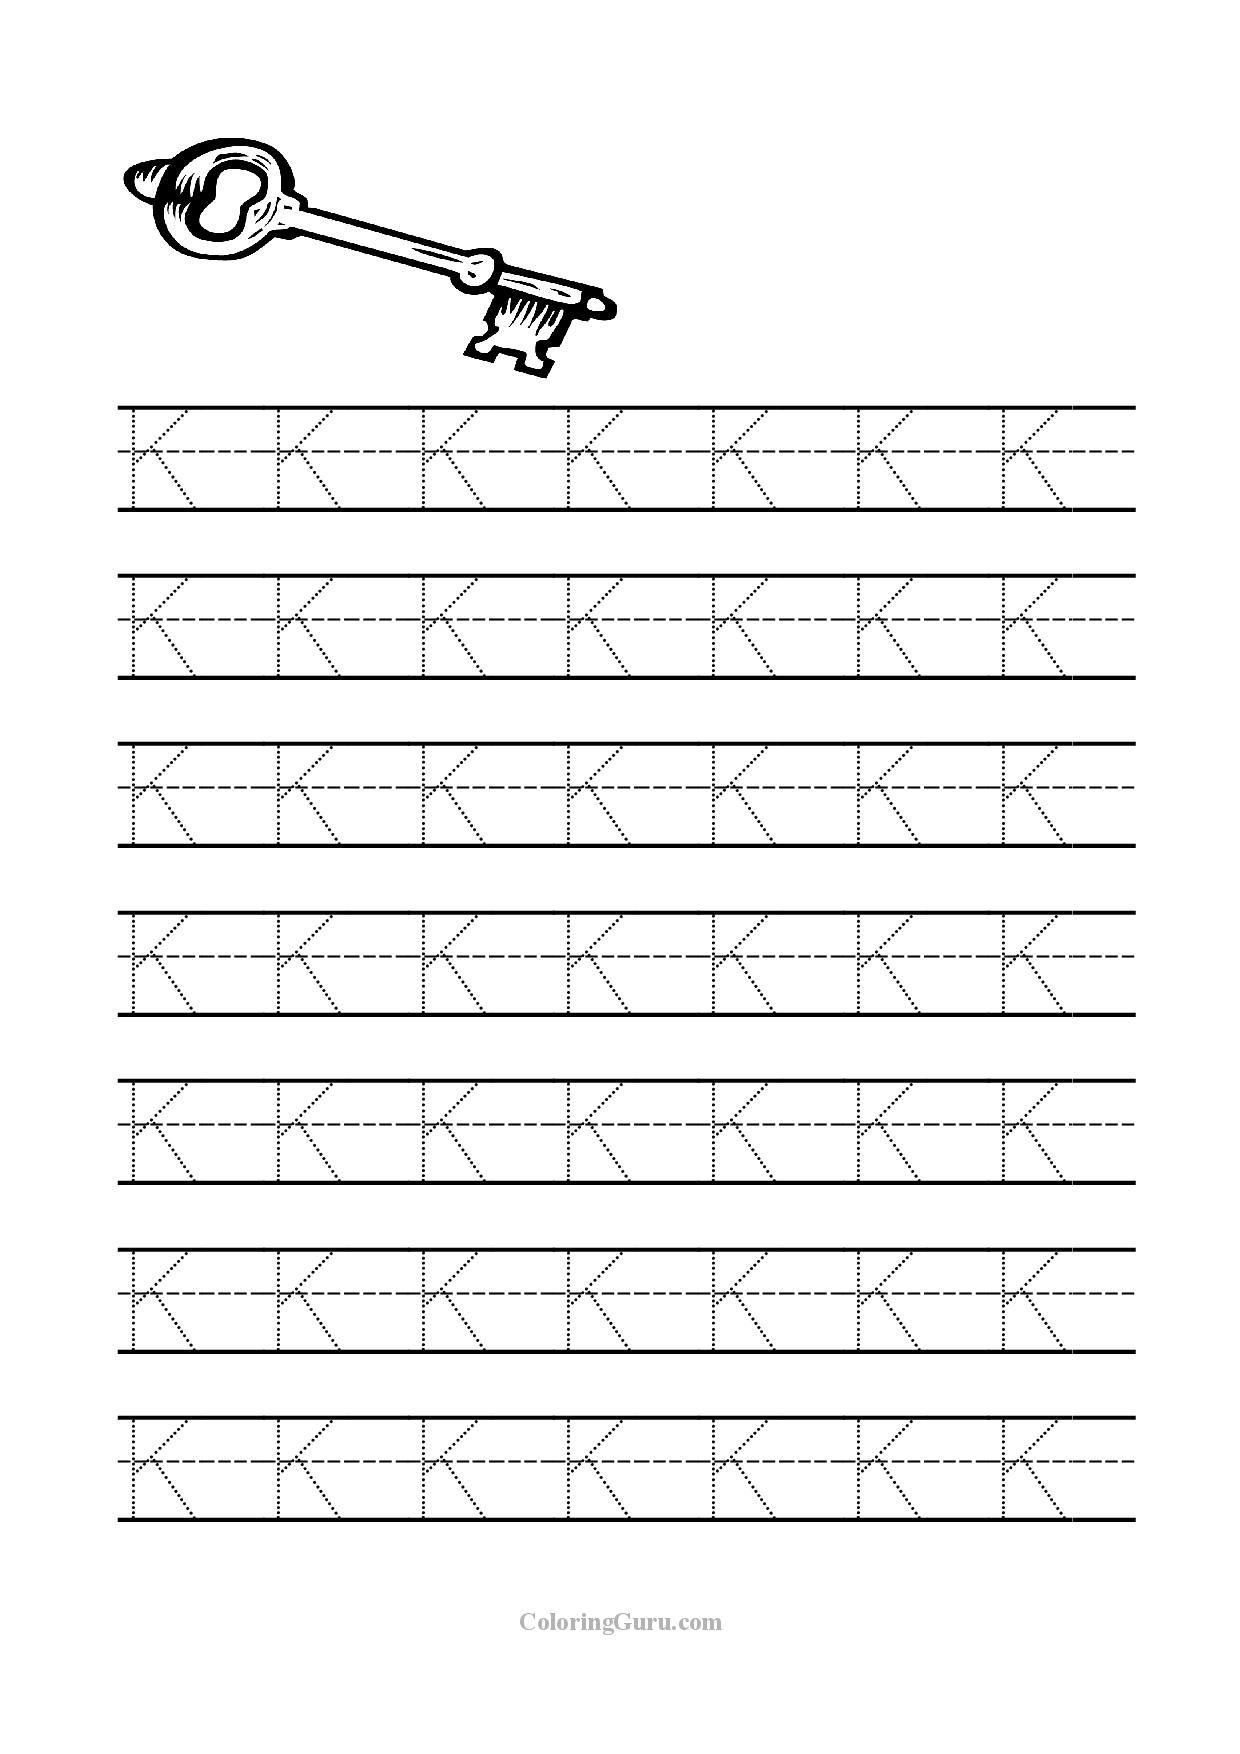 Free Printable Tracing Letter K Worksheets For Preschool | Kids | Letter K Worksheets Printable